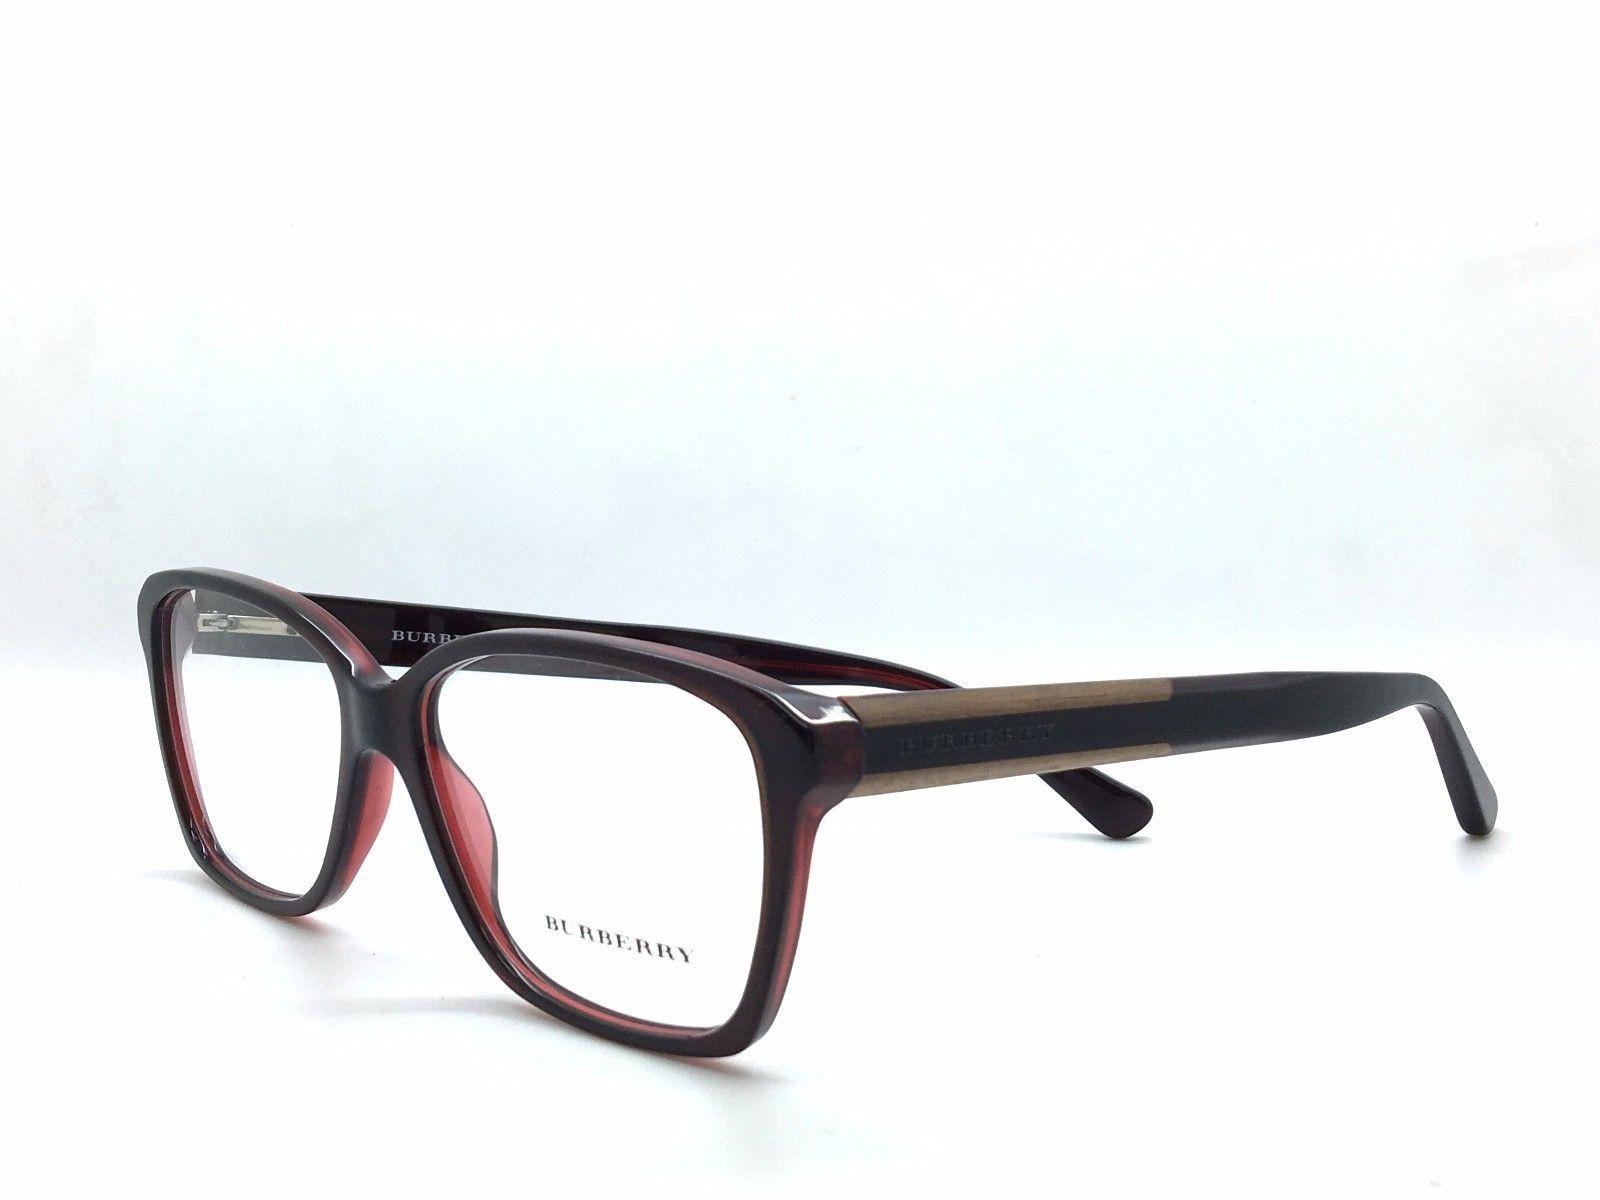 24644b5bc5ac New Burberry BE 2121 Eyeglasses Frames Black and 50 similar items. 57